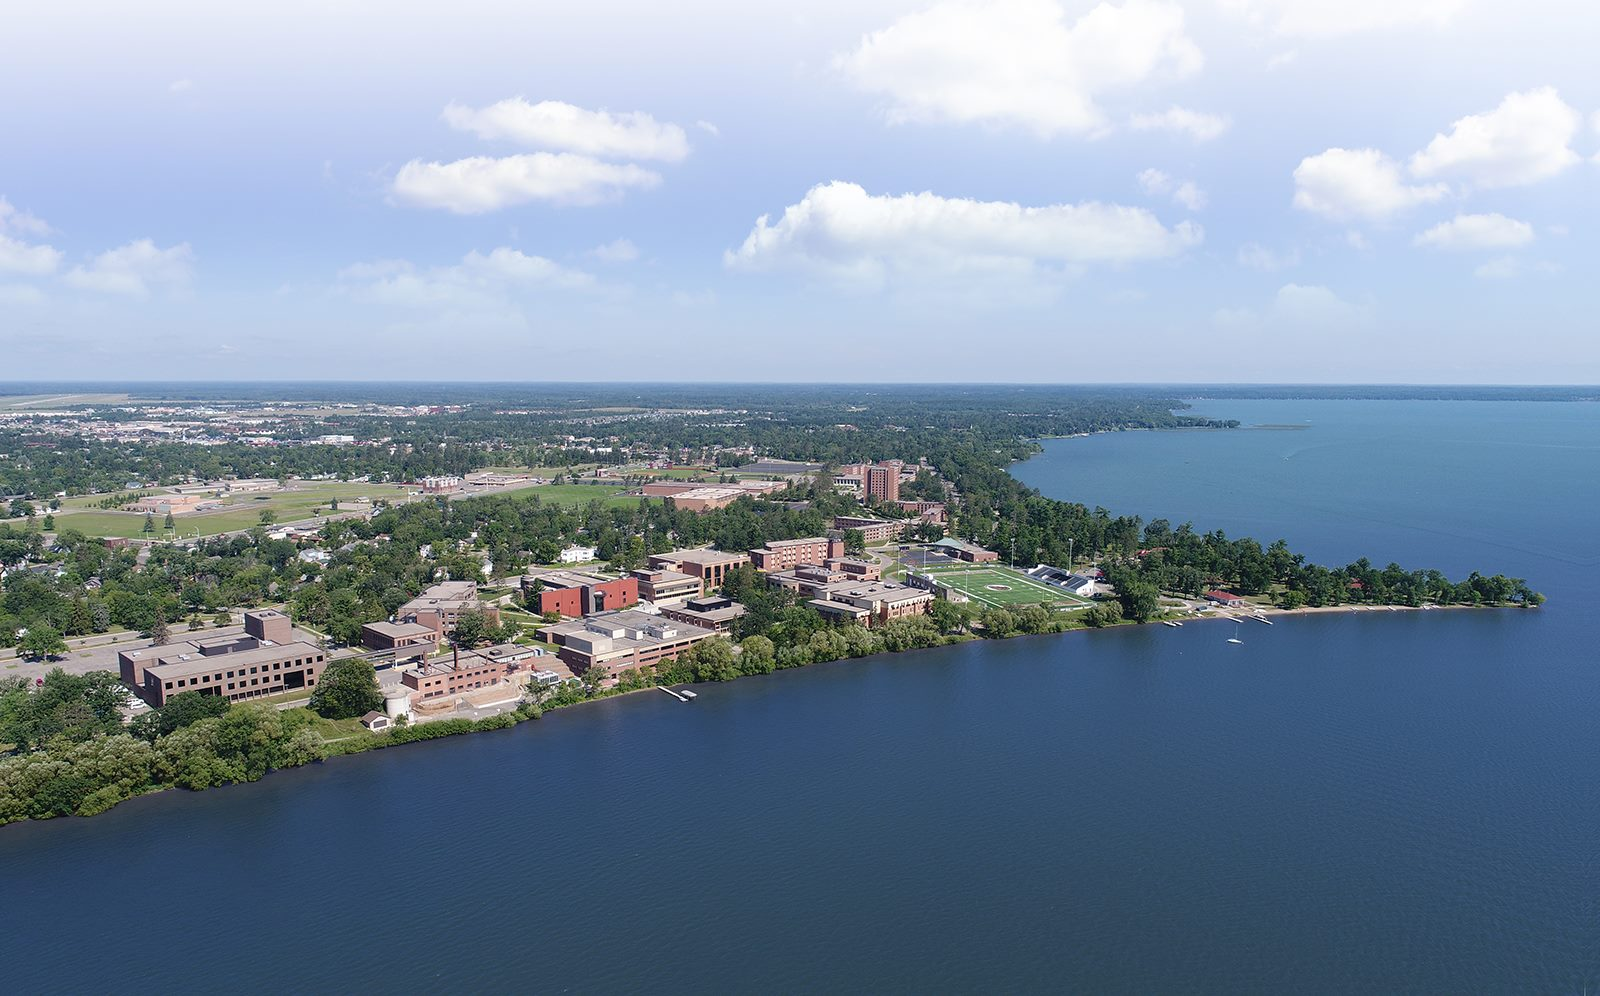 Bemidji State on the shores of Lake Bemidji